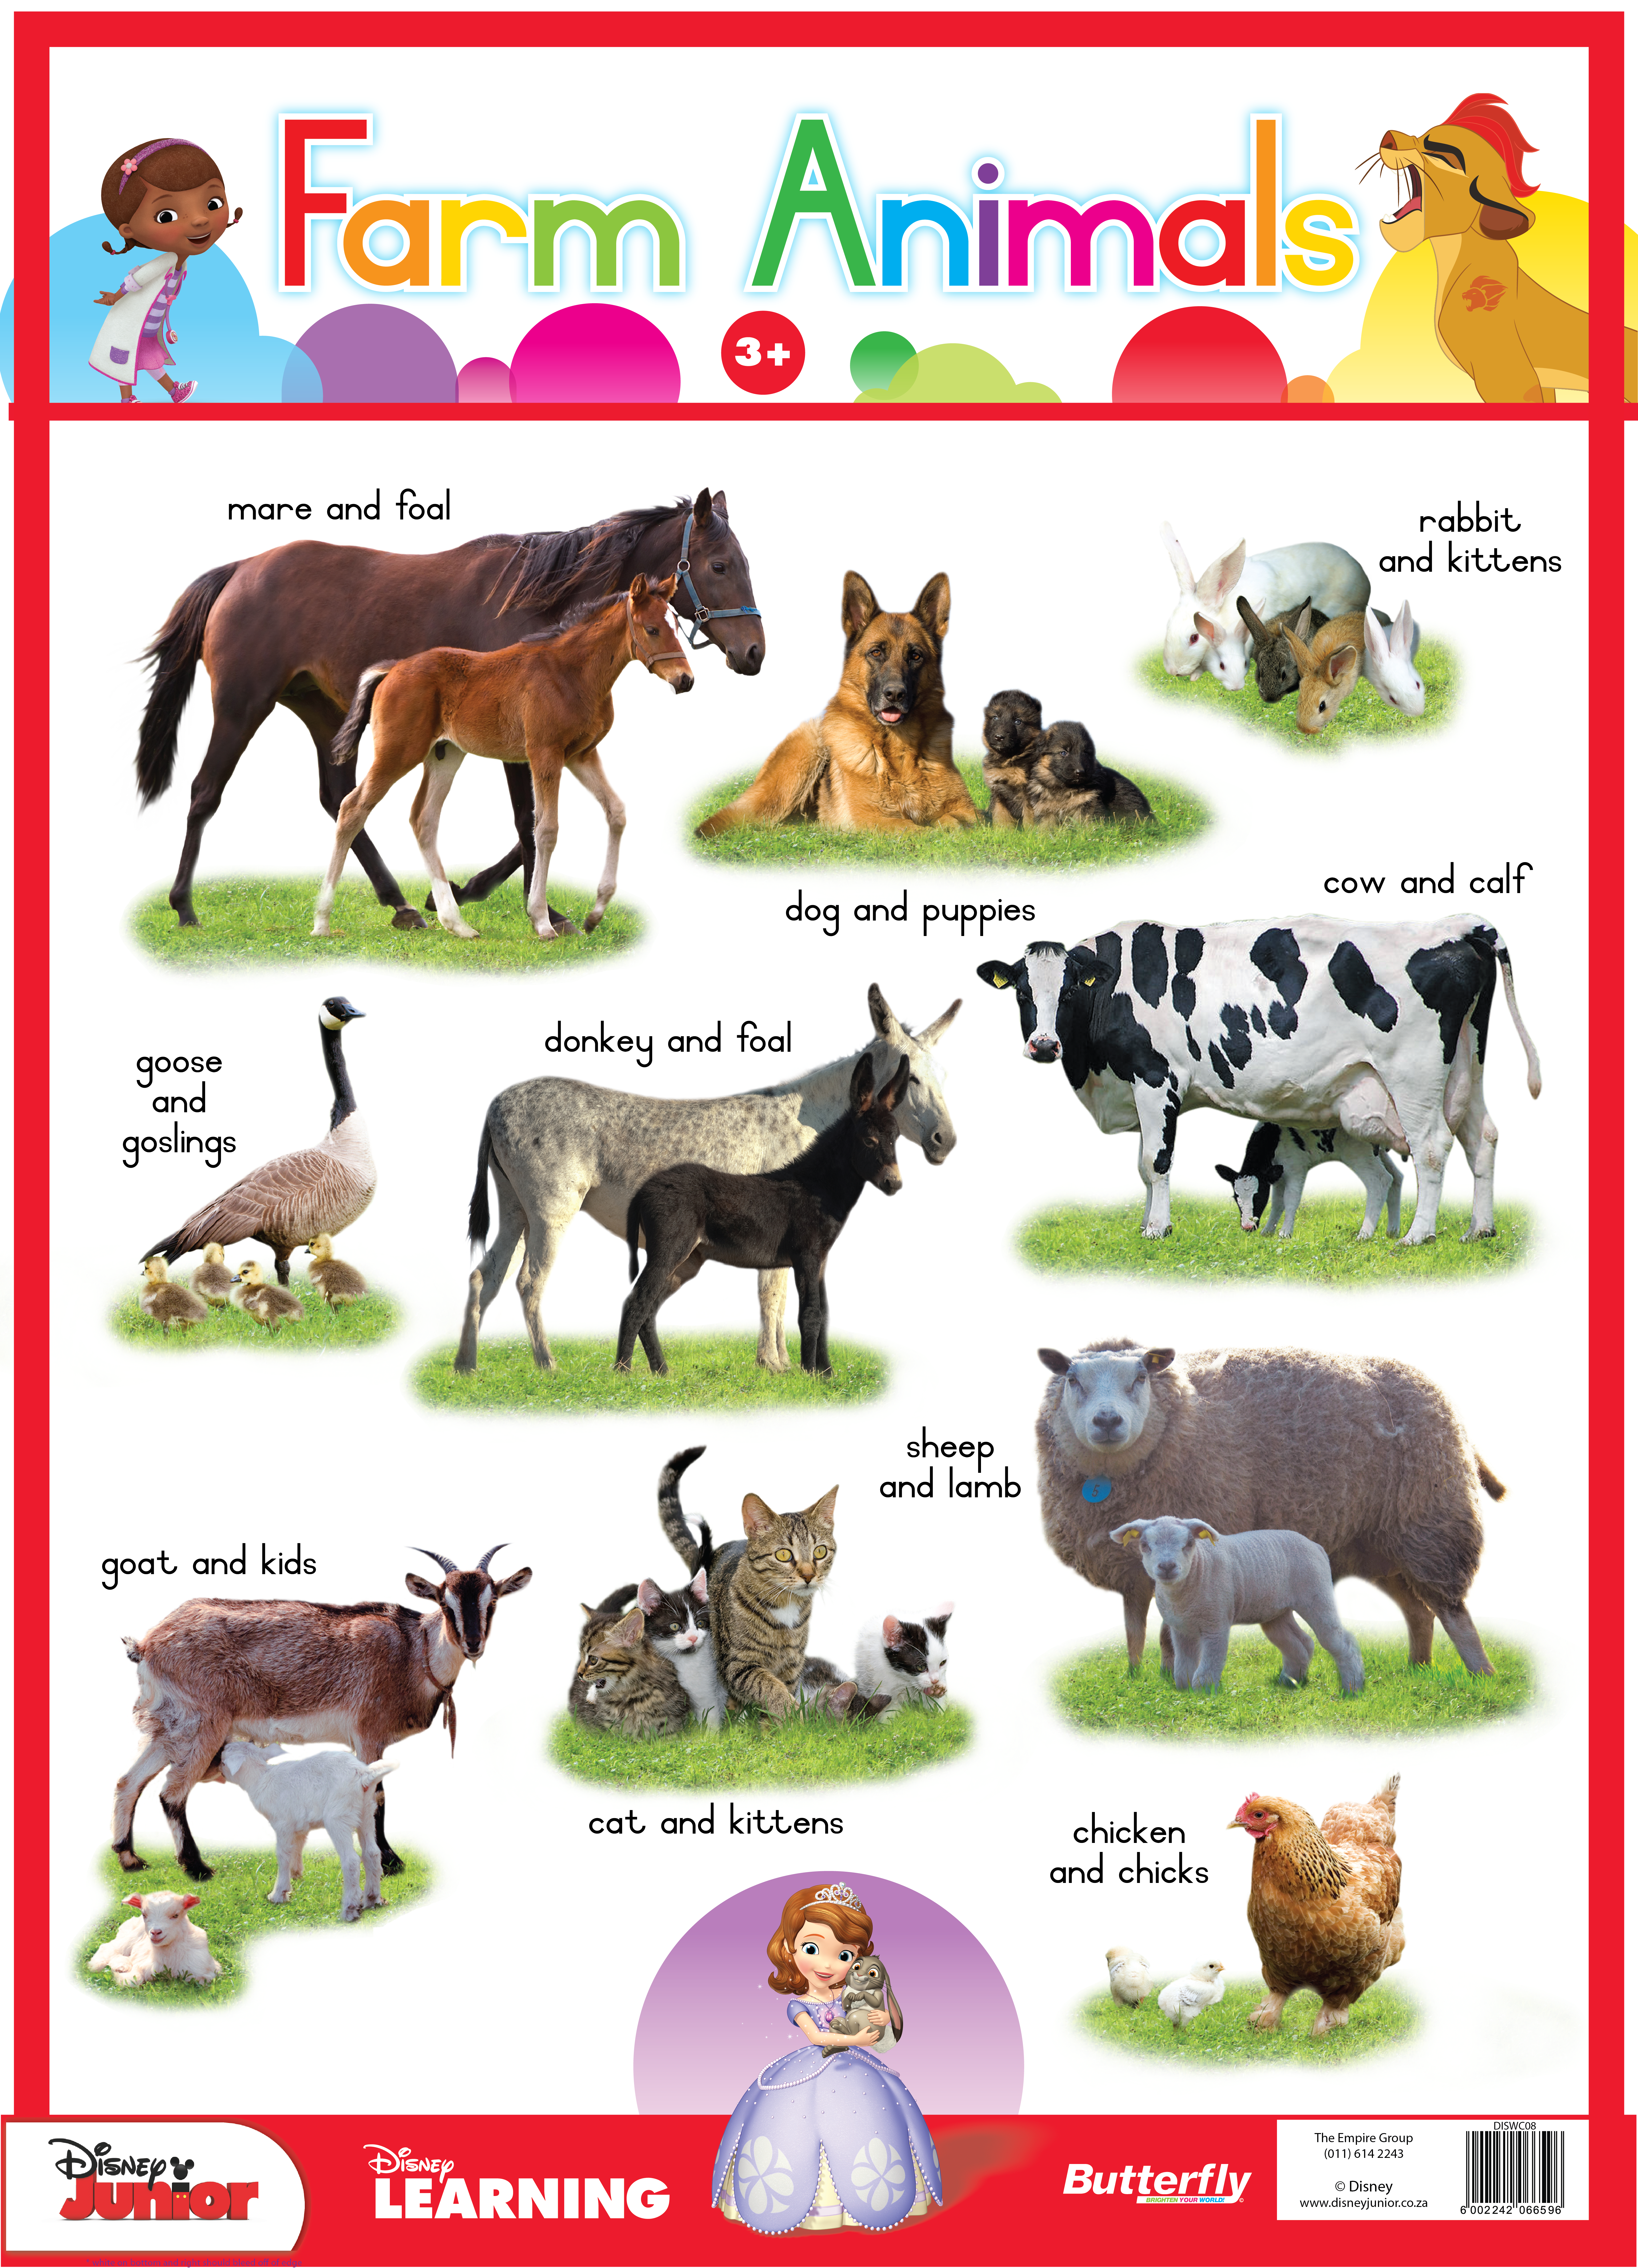 Disney Poster - Farm Animals